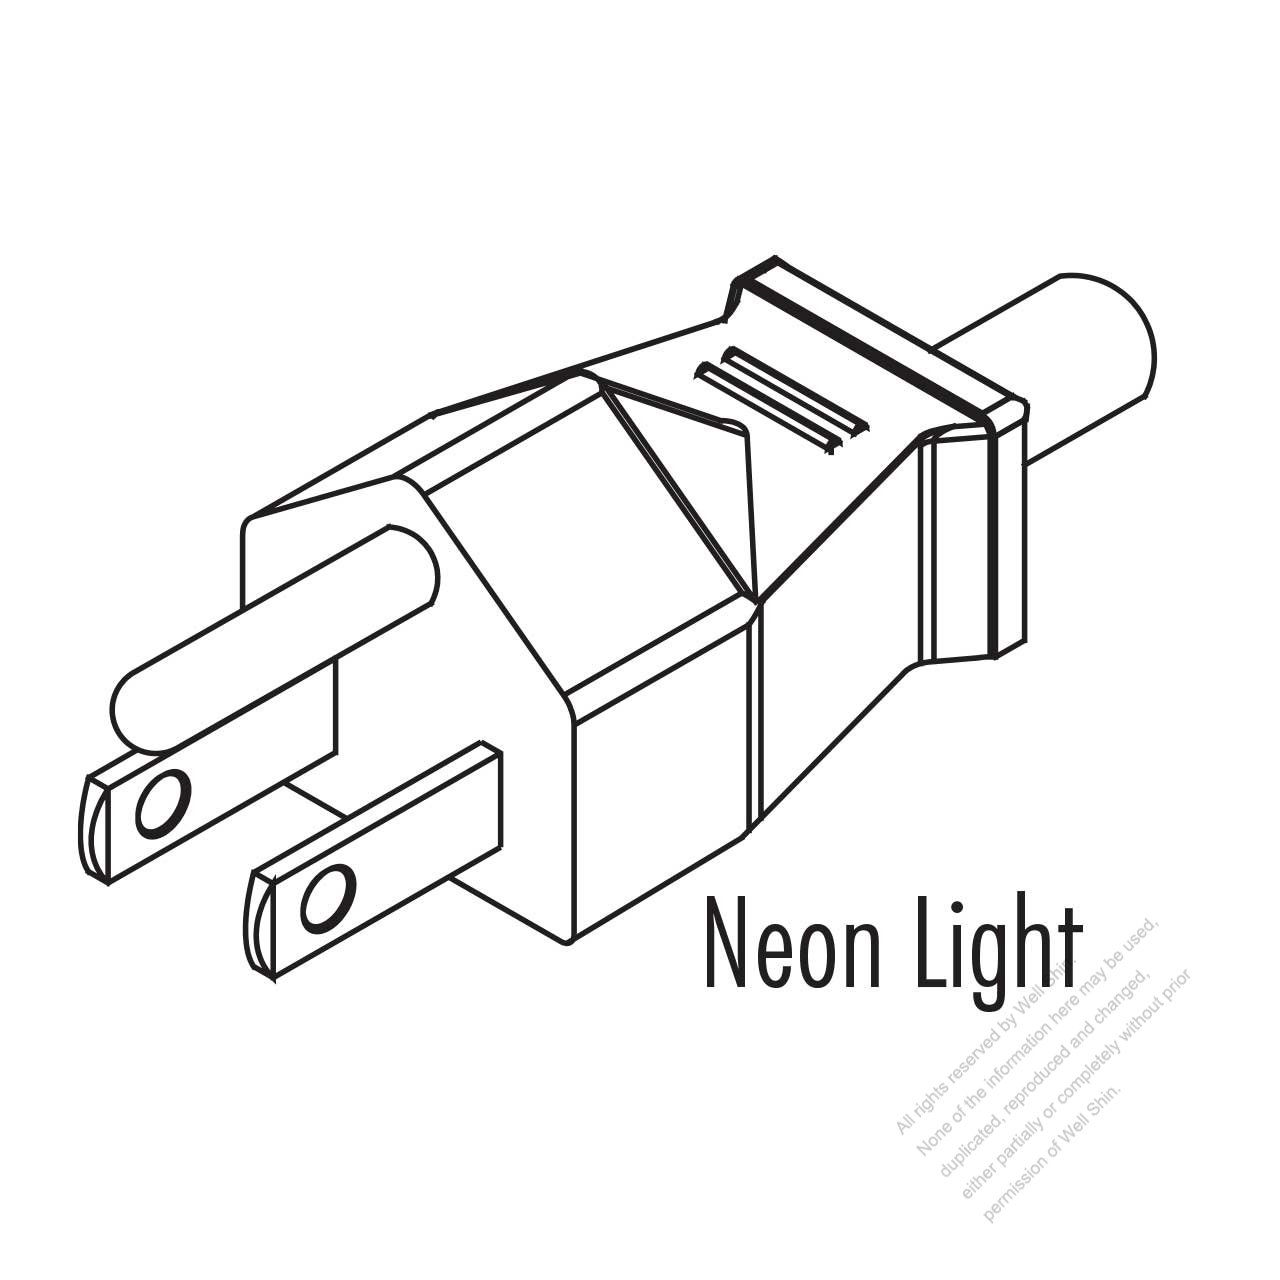 fender deluxe nashville telecaster wiring diagram fender strat wiring diagram